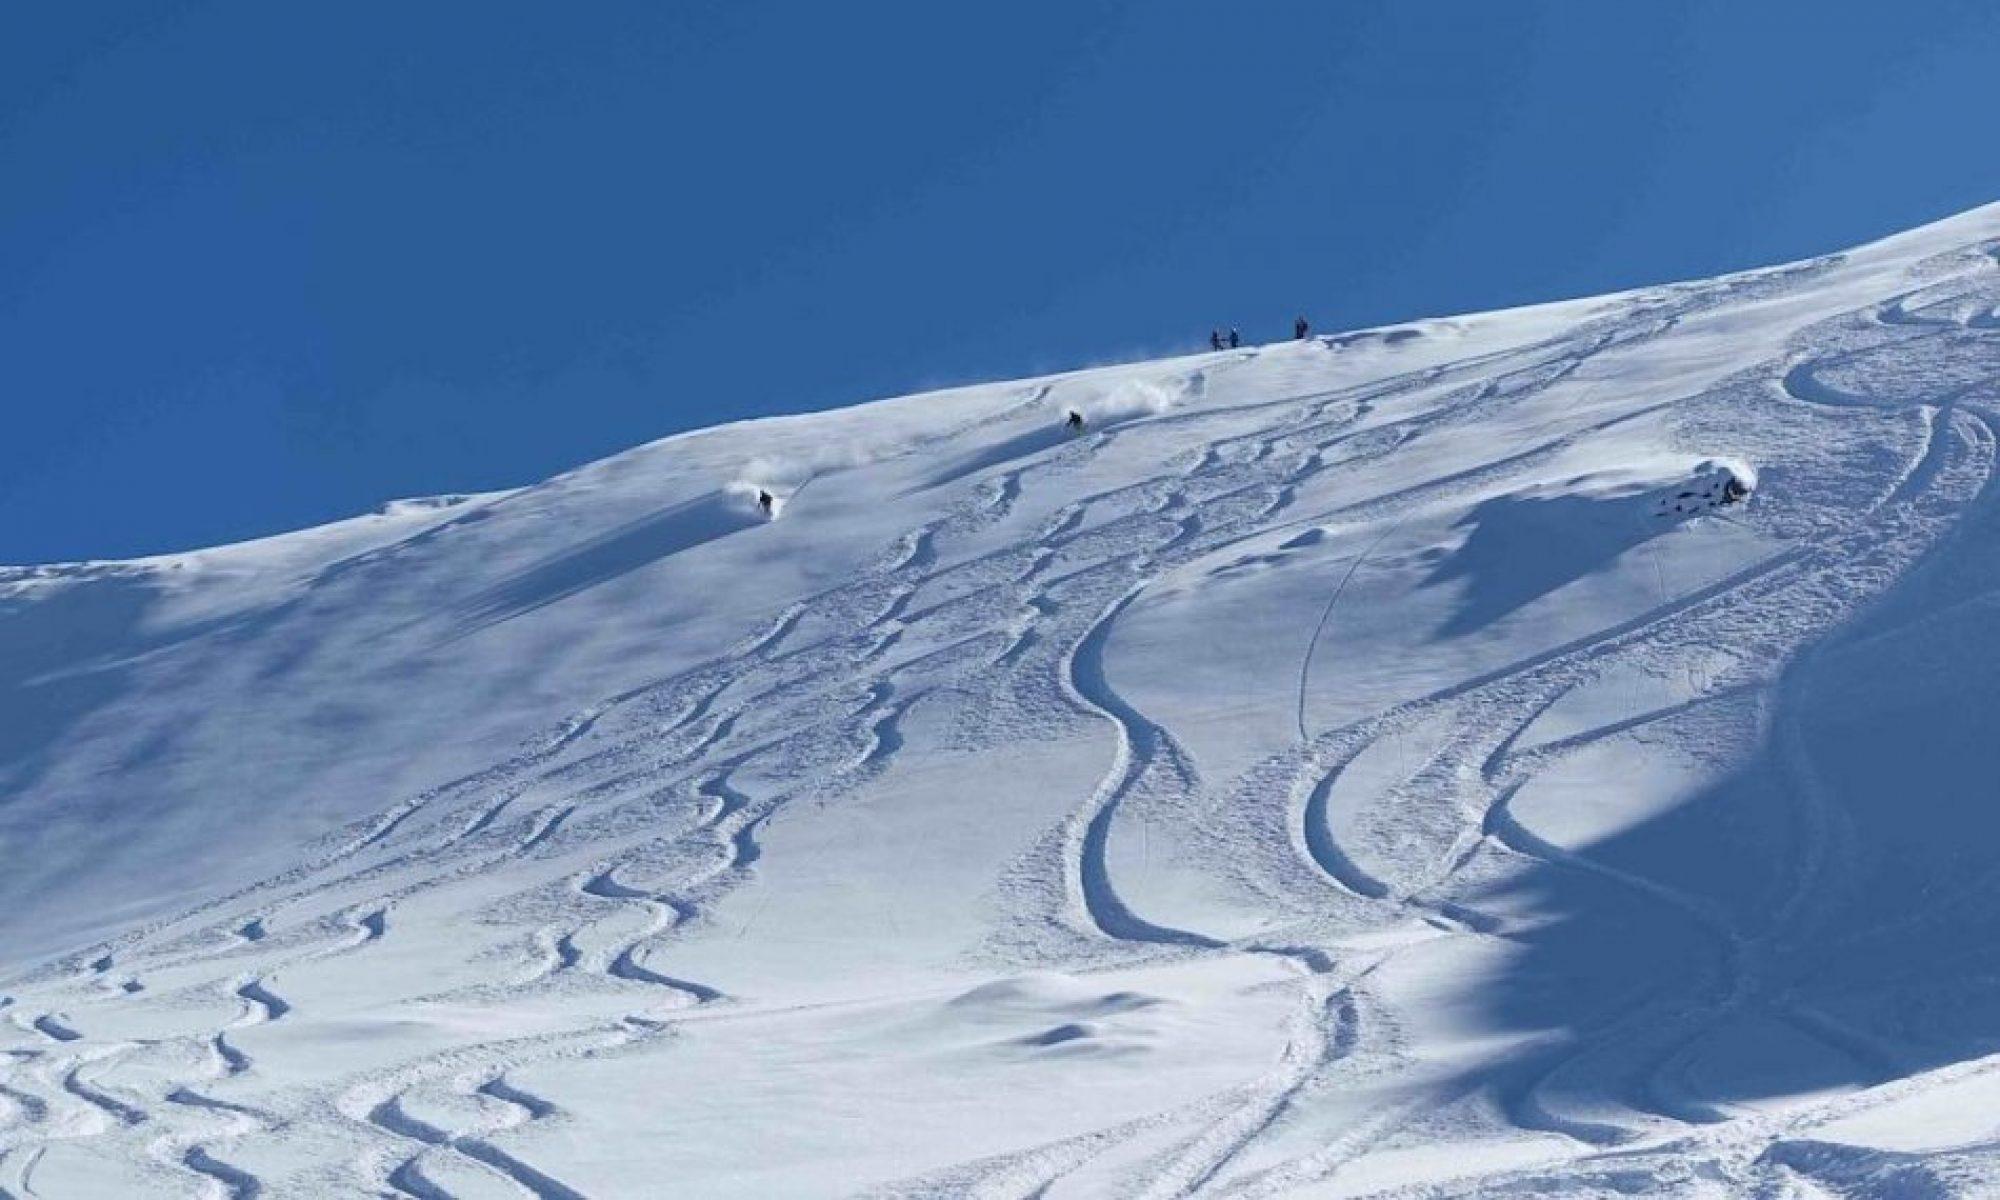 Guias ski y snowboard en La Grave La Meije